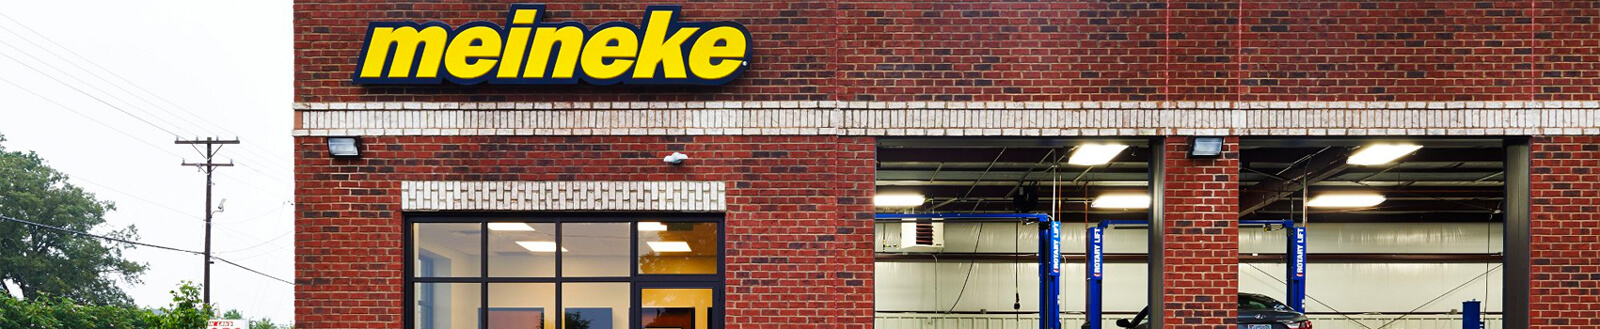 Meineke shop's front